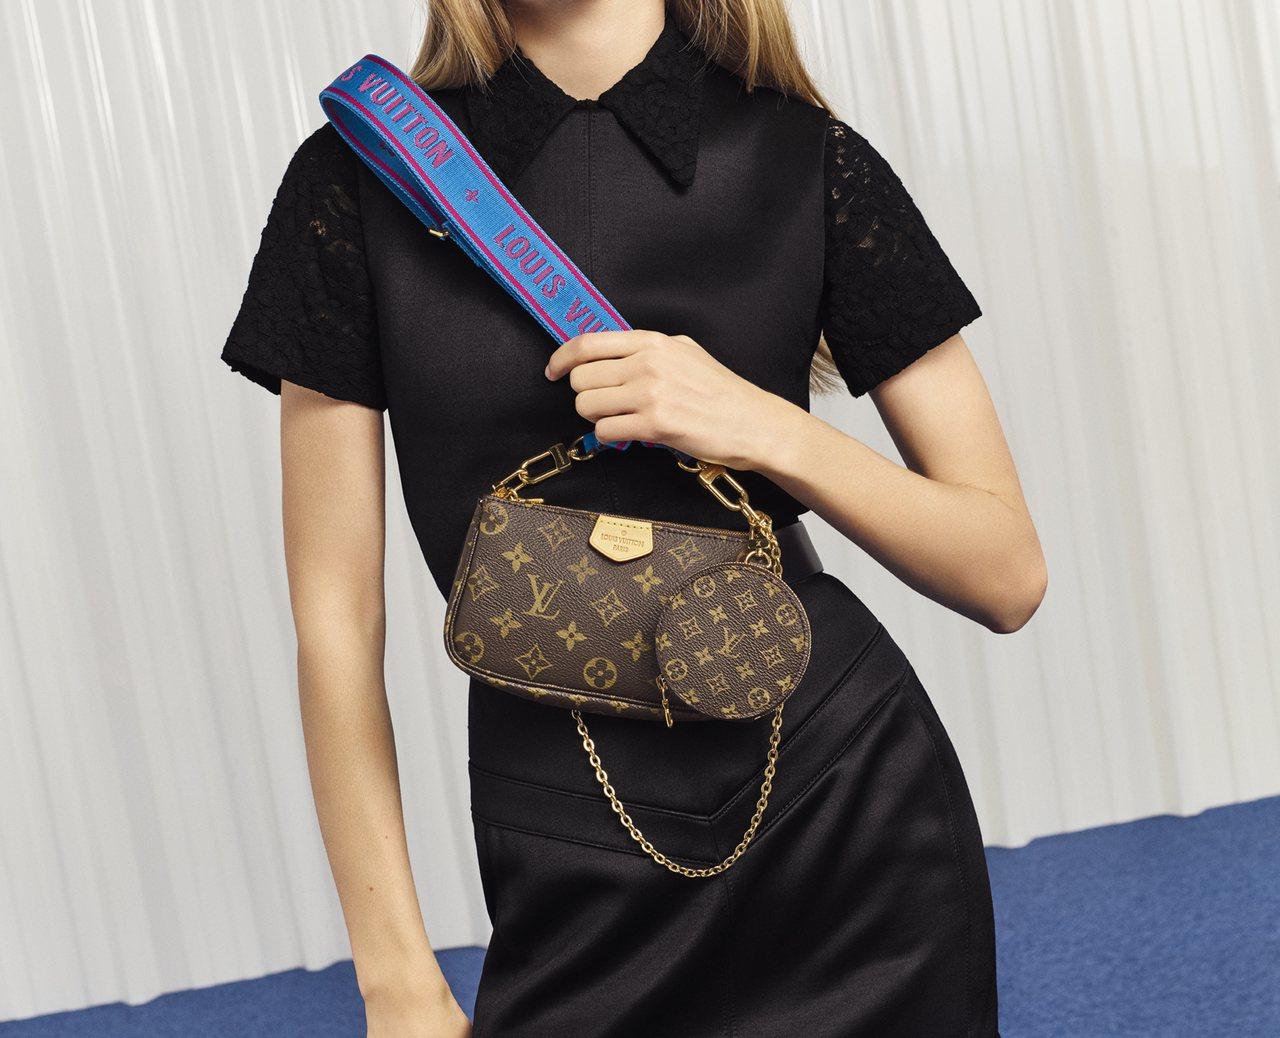 Multi Pochette Accessoires手袋將於10月之後在全球路易...